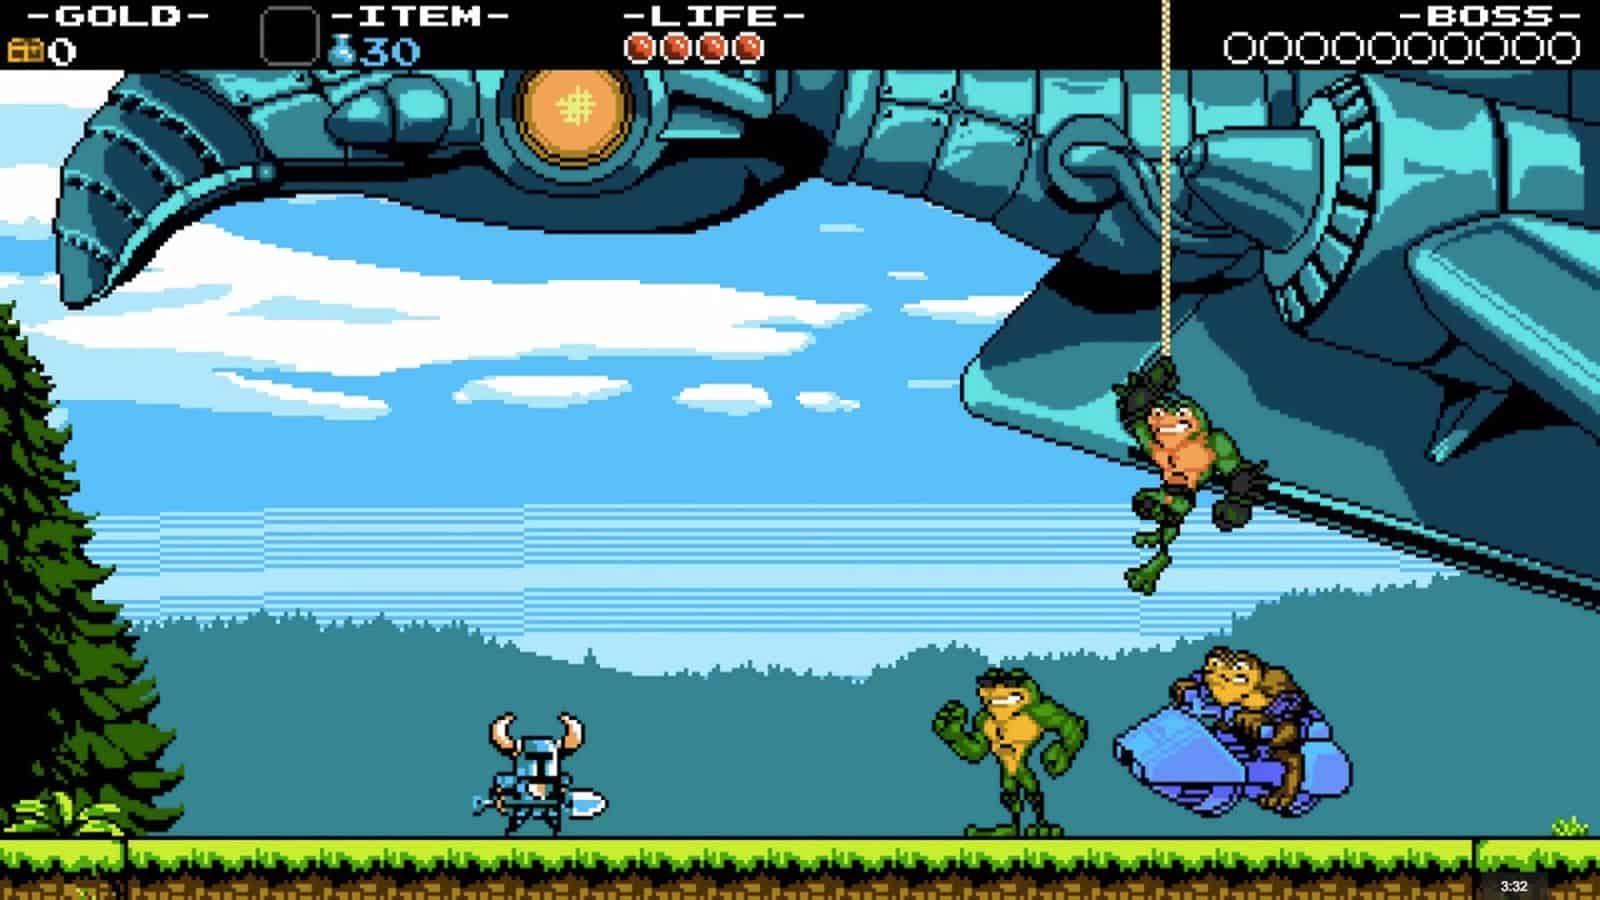 Battletoads – popular video game